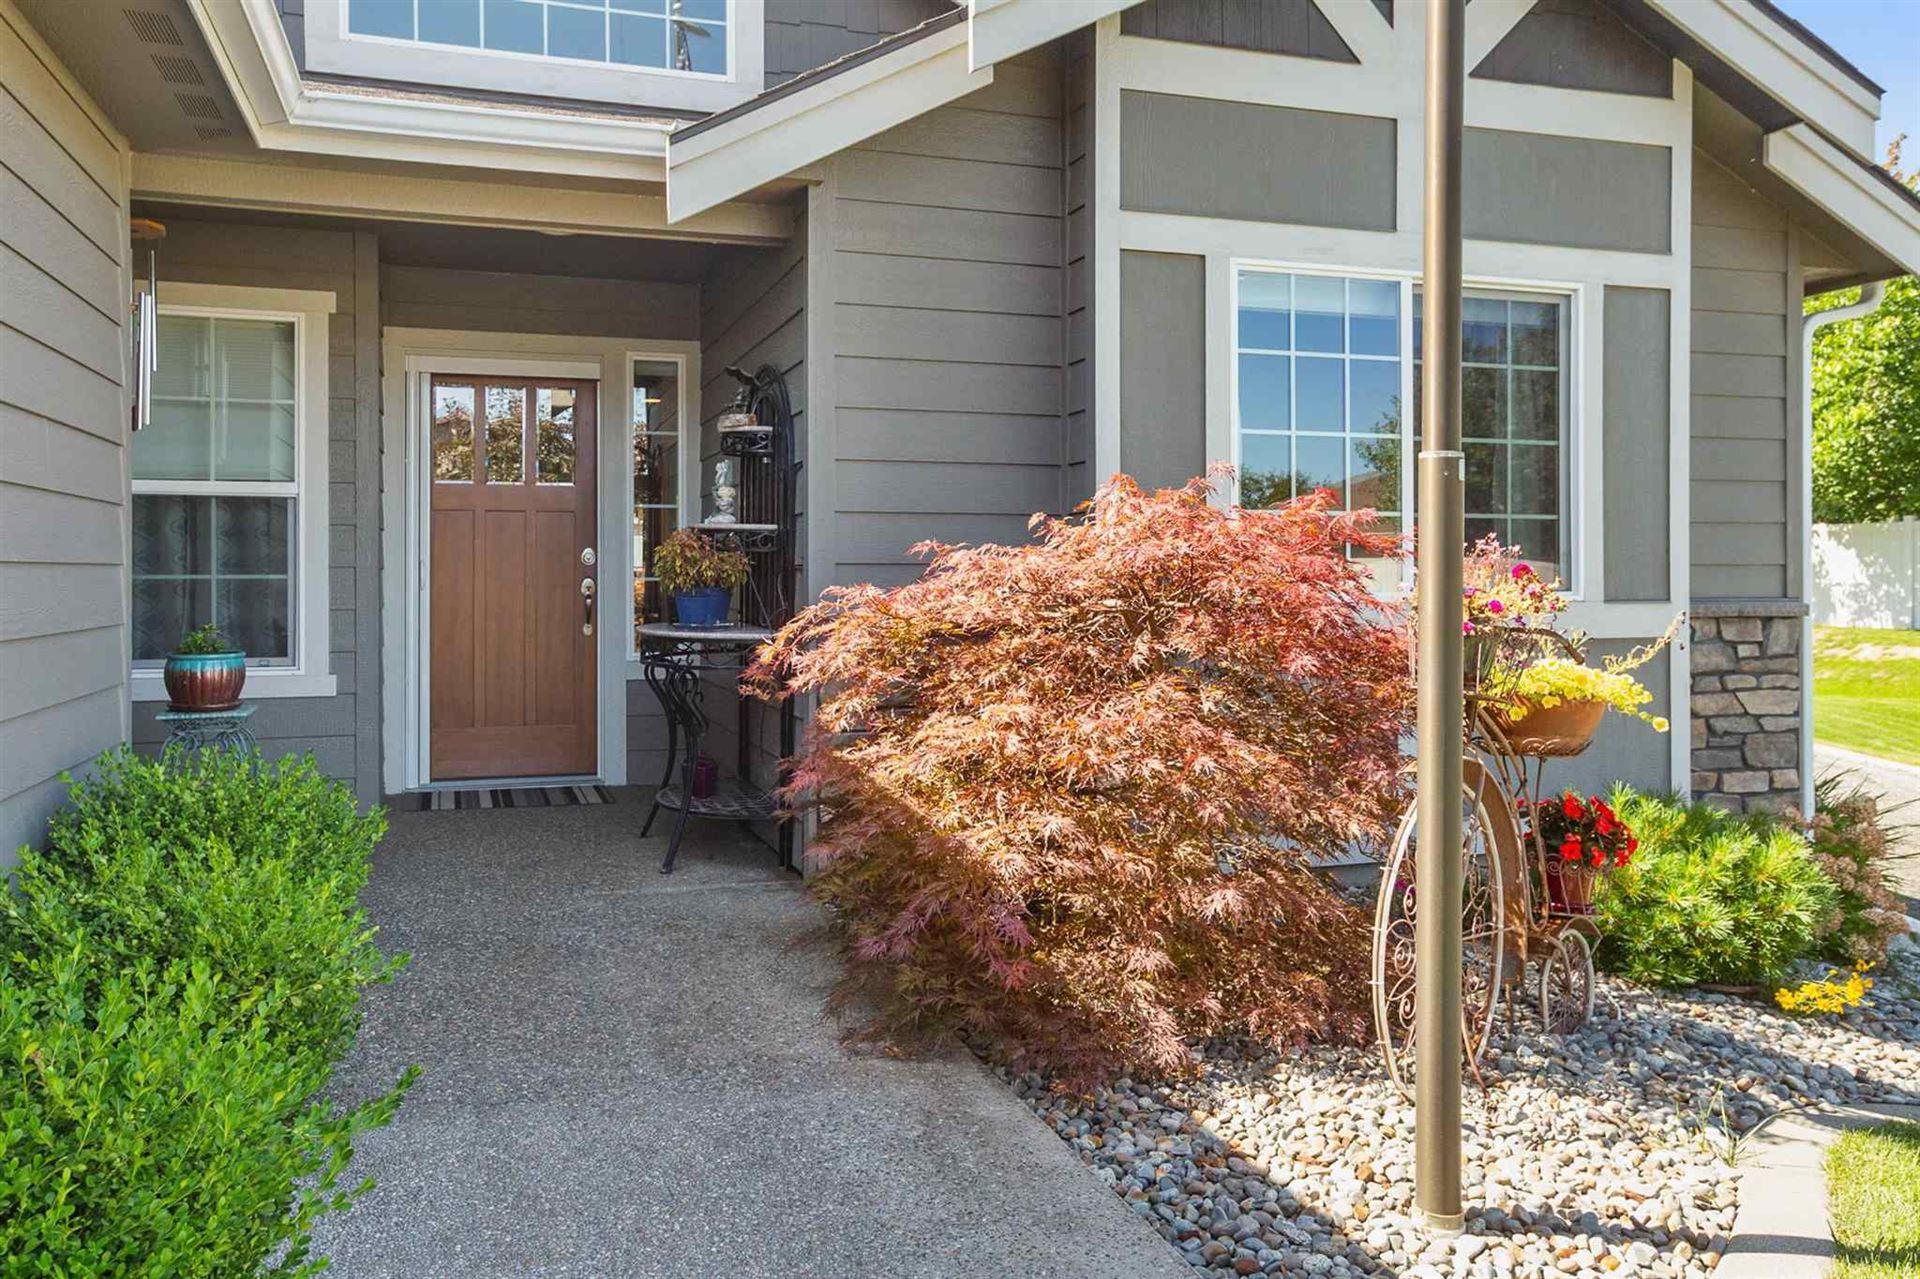 Photo of 5030 S Stone Crest Ln, Spokane, WA 99223-5099 (MLS # 202121270)